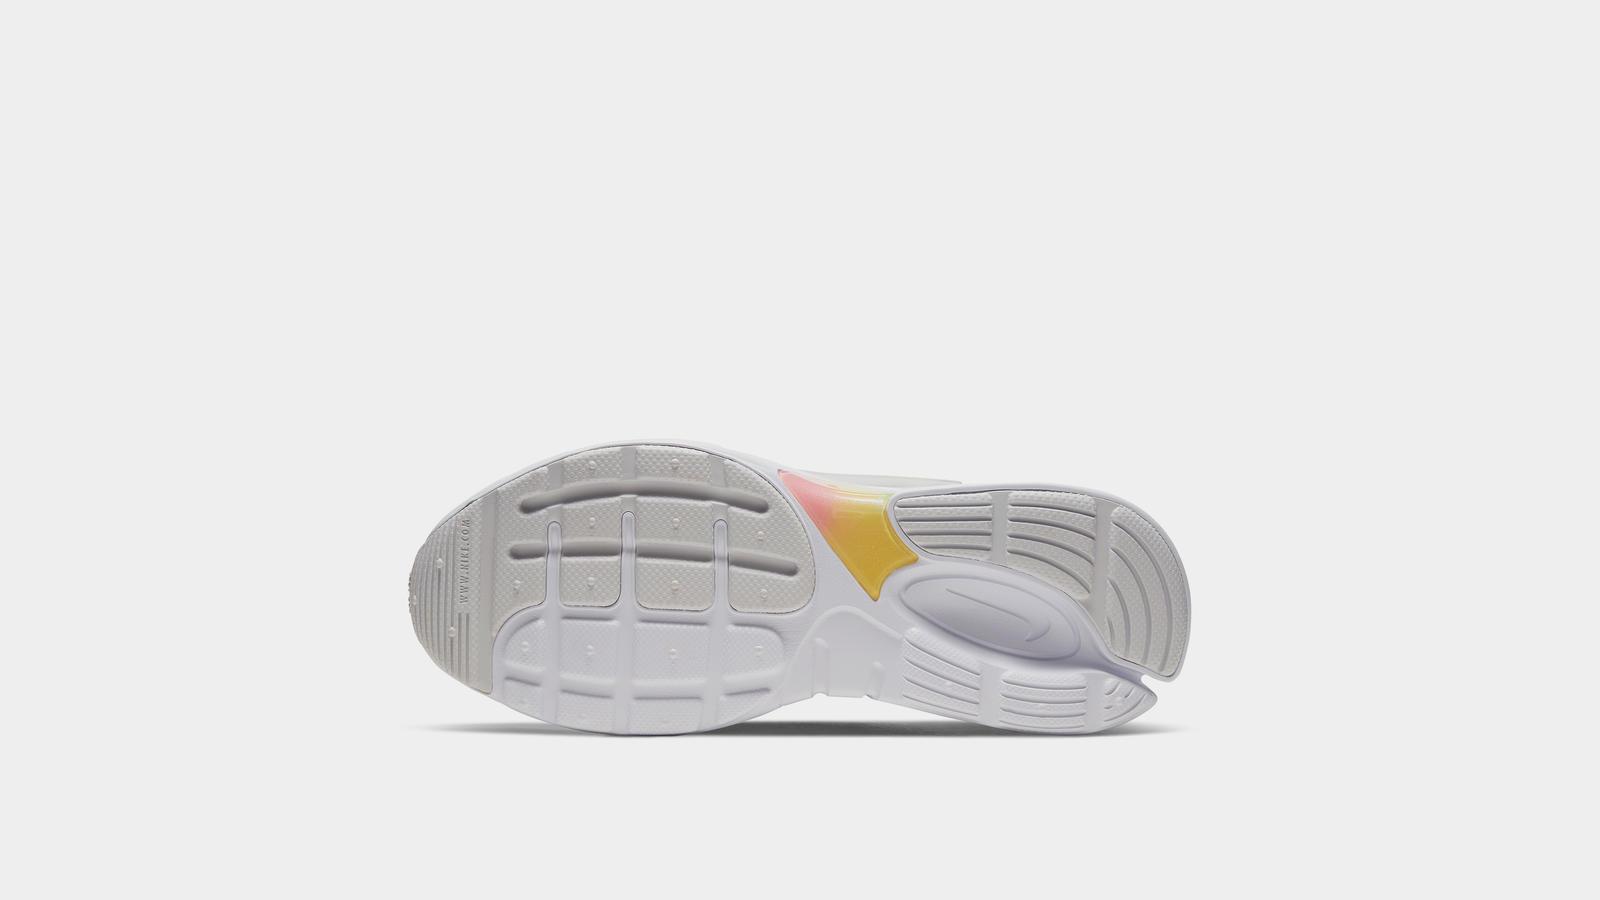 Nike Alphina 5000 8